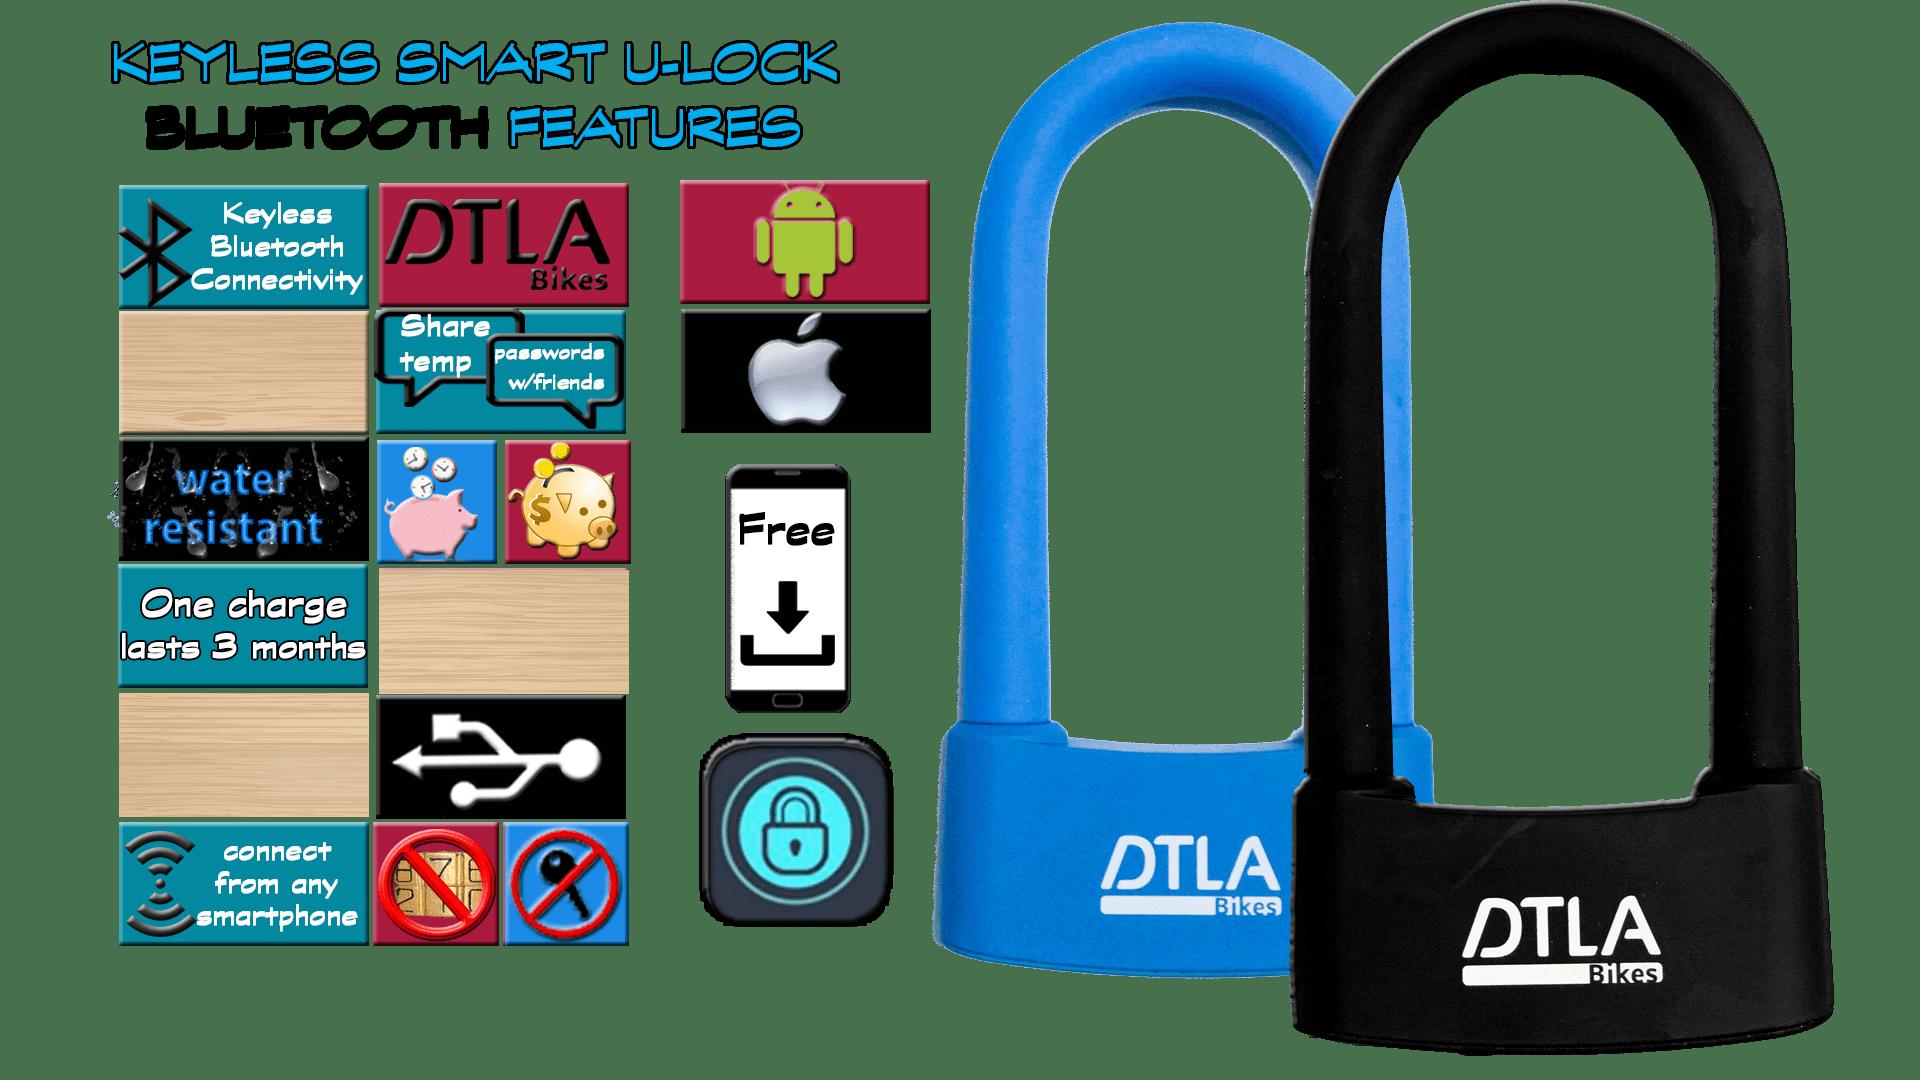 dtla bikes bluetooth keyless